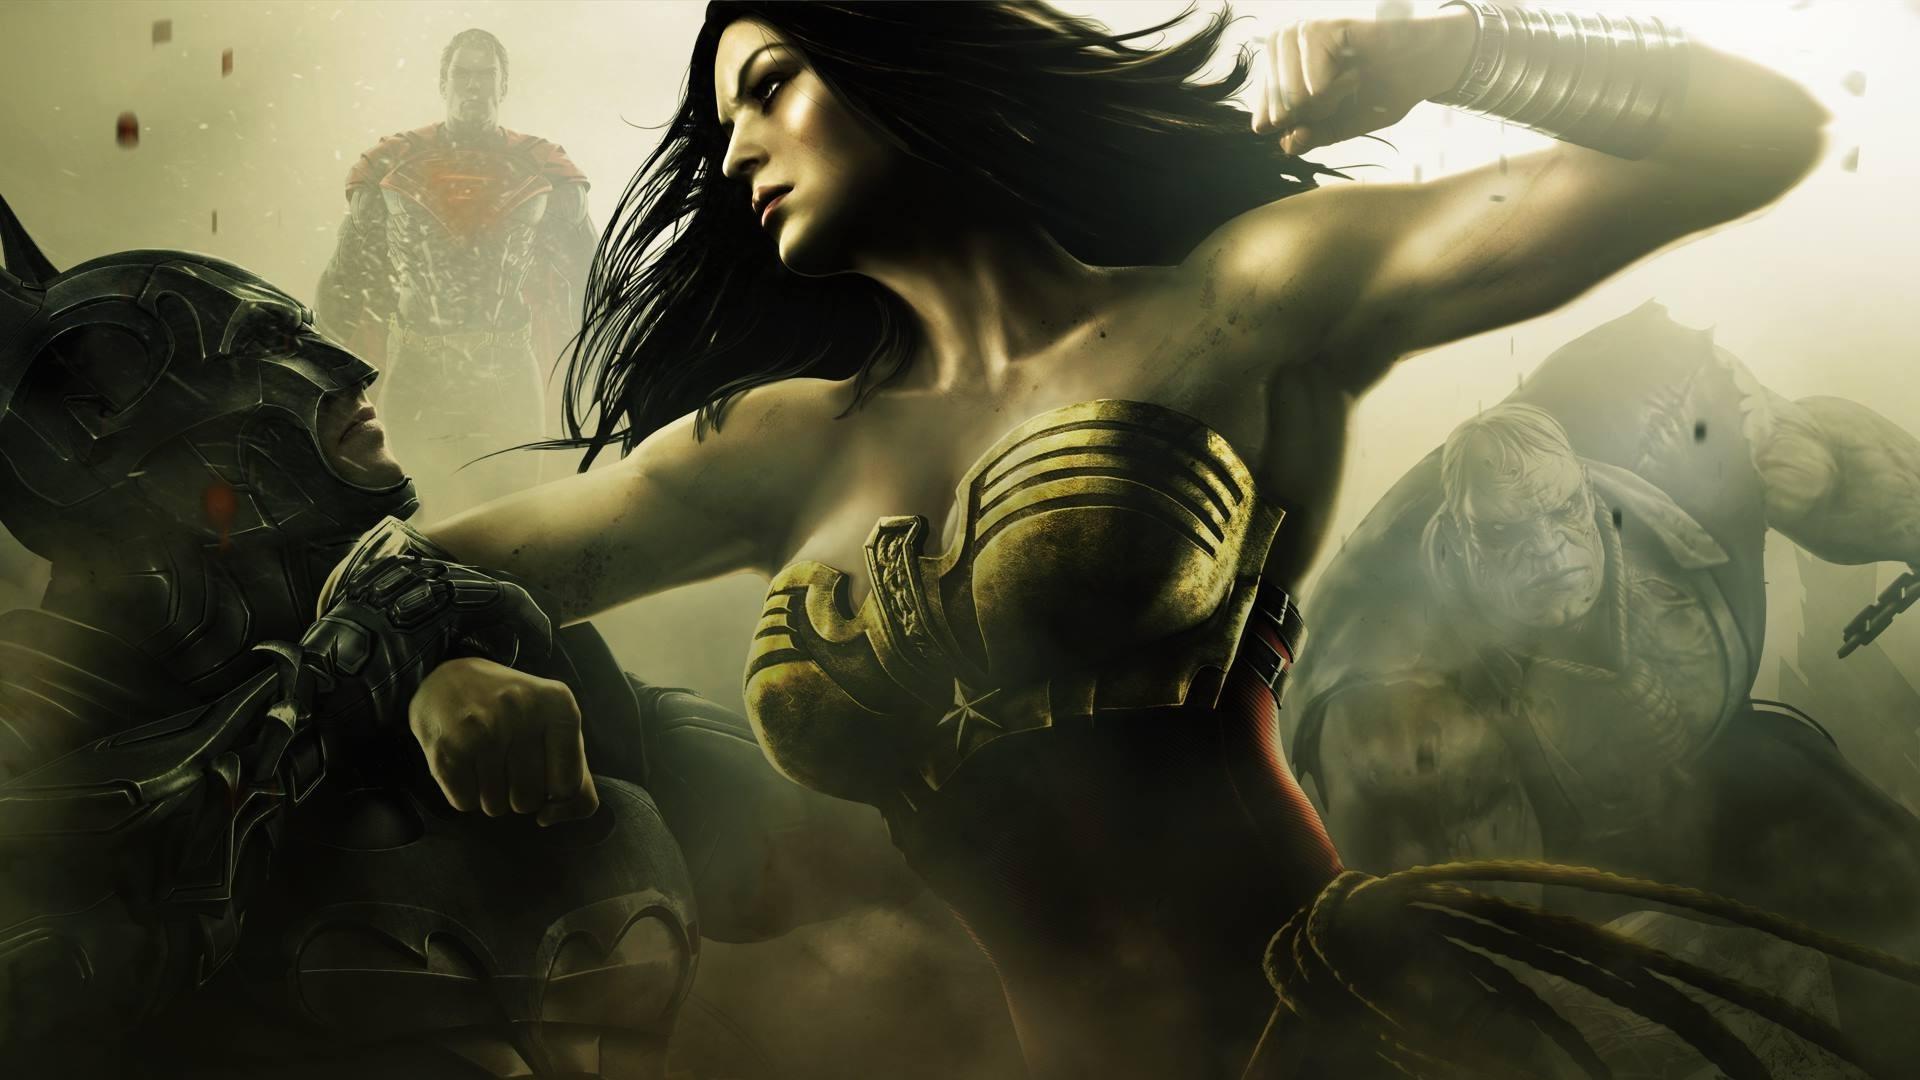 Wonder Woman ozadje 1920X1080 - Impremedianet-1594